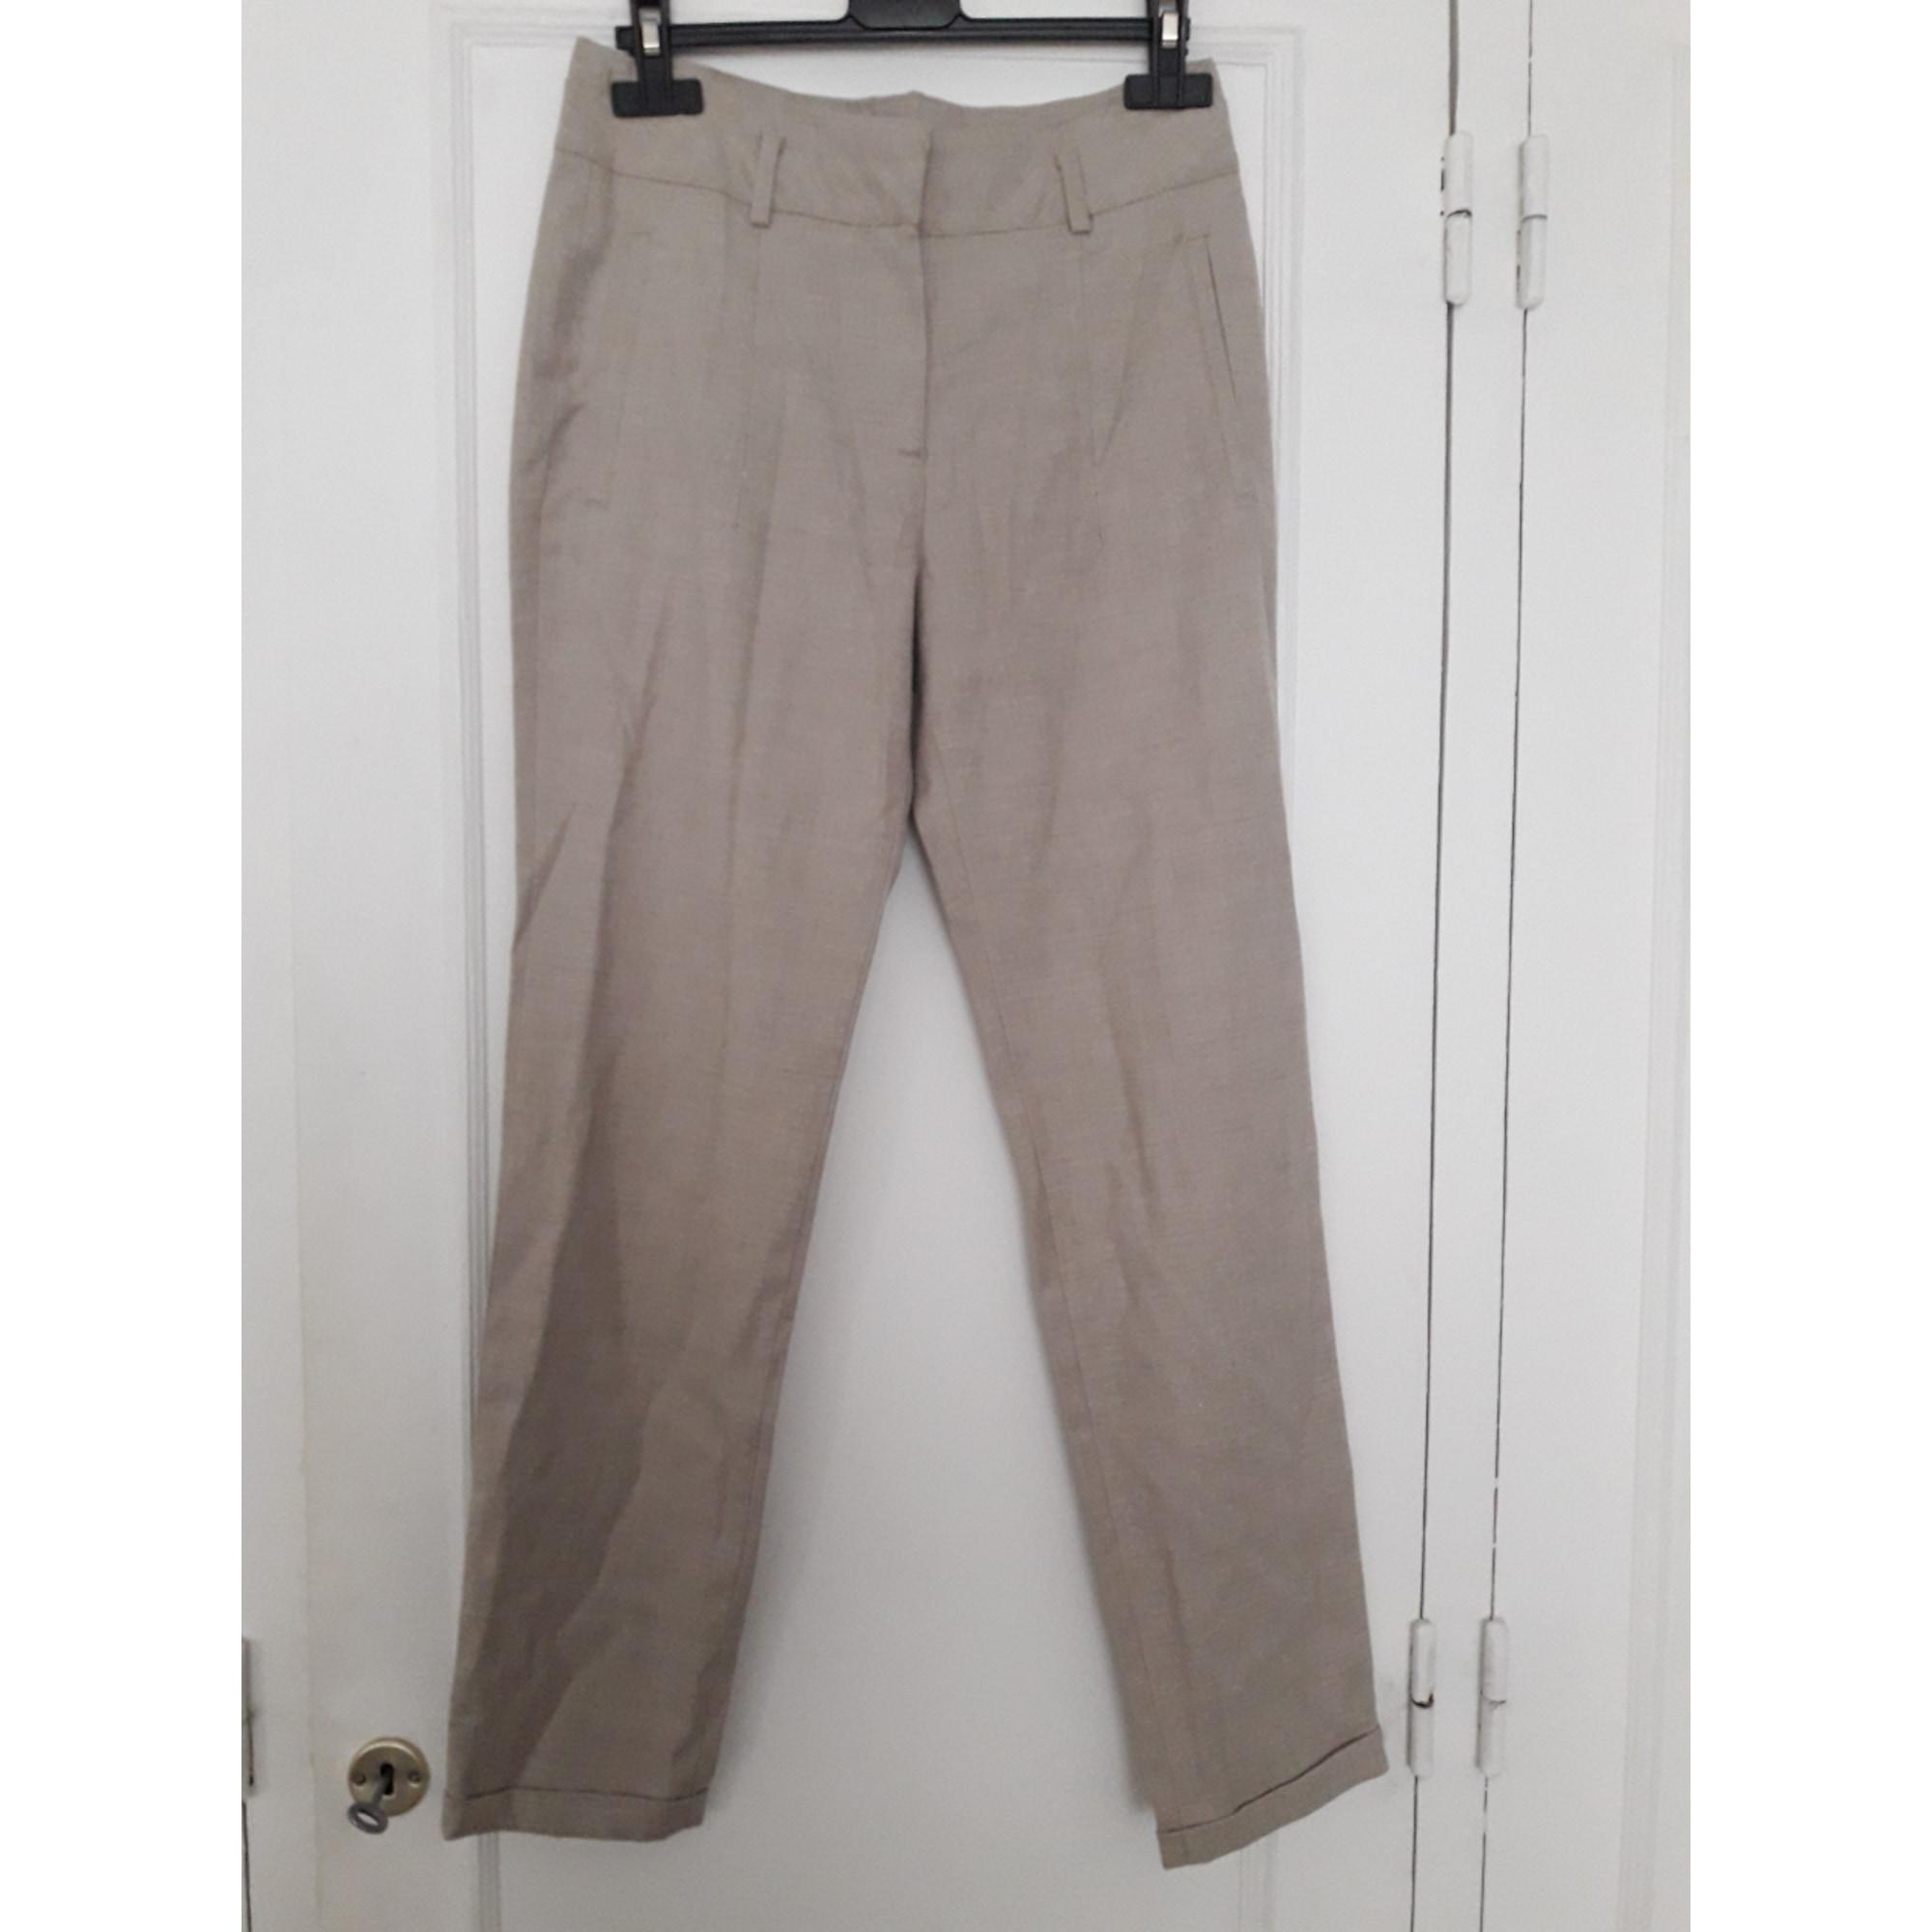 Pantalon carotte ZARA Beige, camel